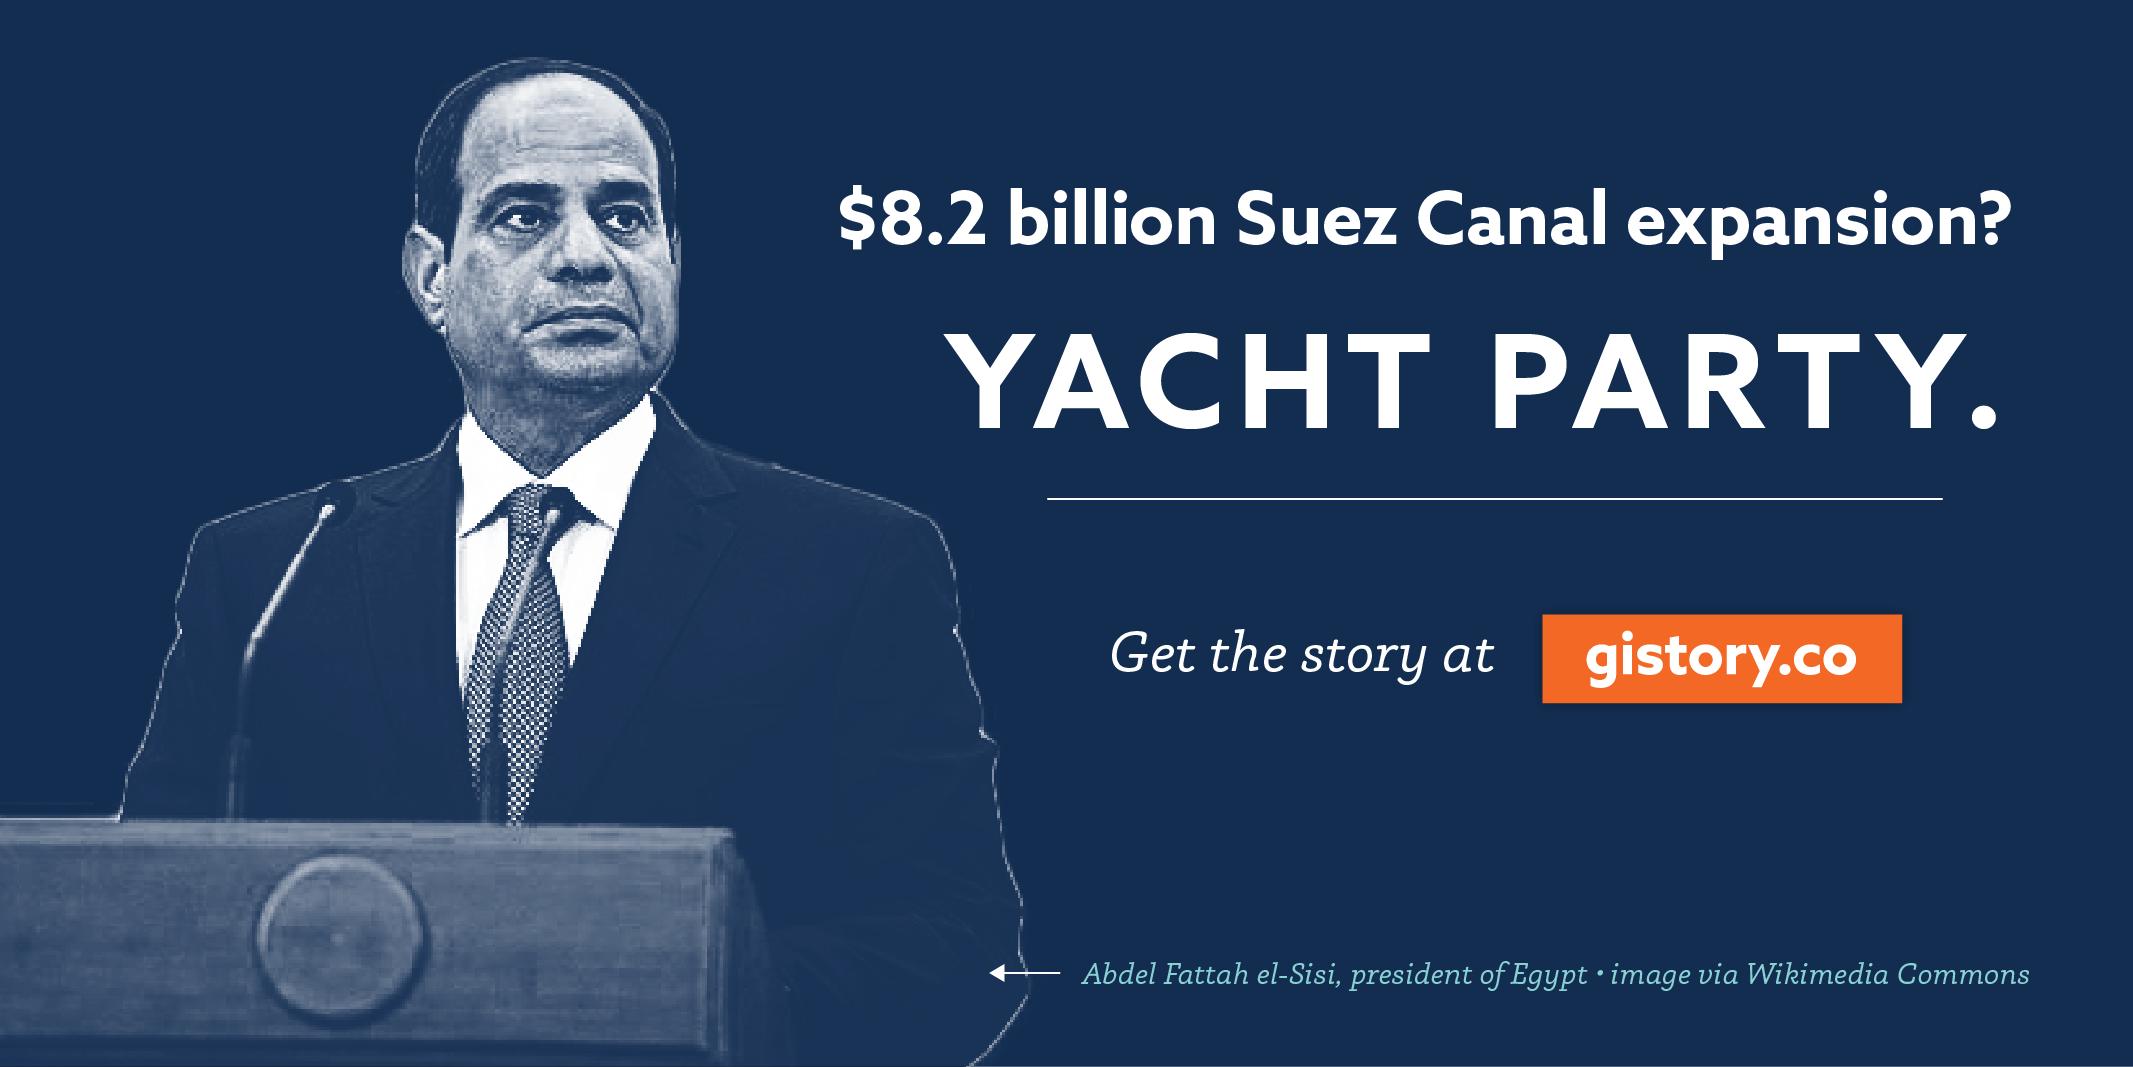 Suez_Canal_Expansion_Twitter.png